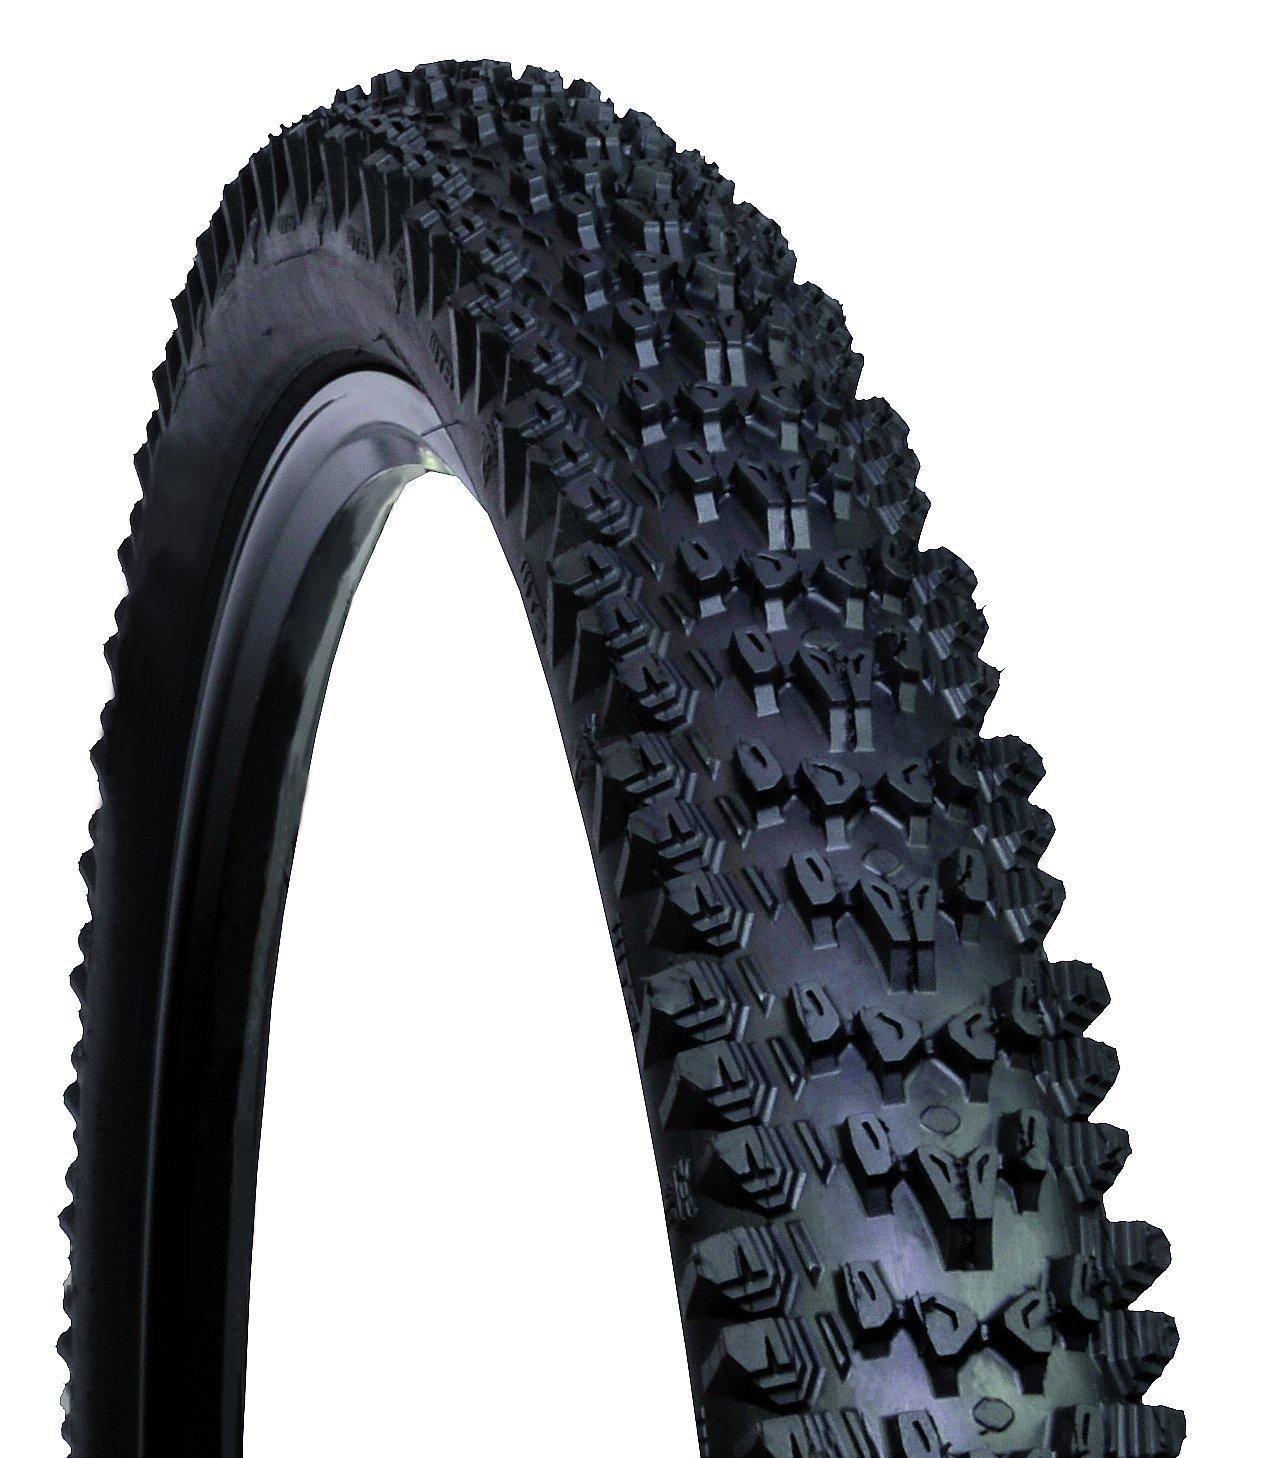 WTB Weirwolf 2.3 Comp Tire [並行輸入品] B077QR6T3K